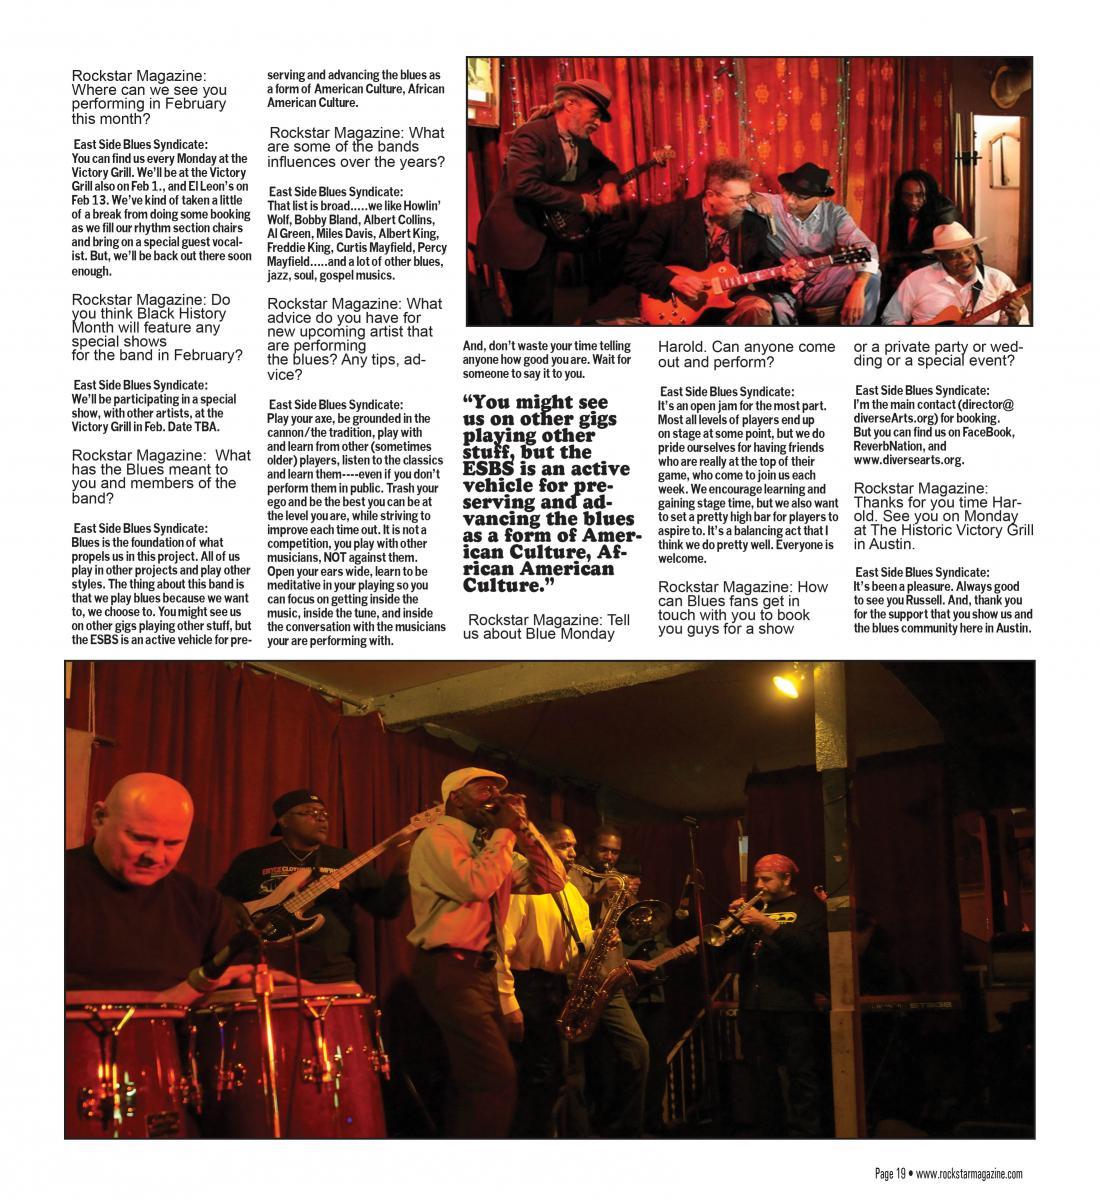 Rockstar Magazine: Feb. 2014